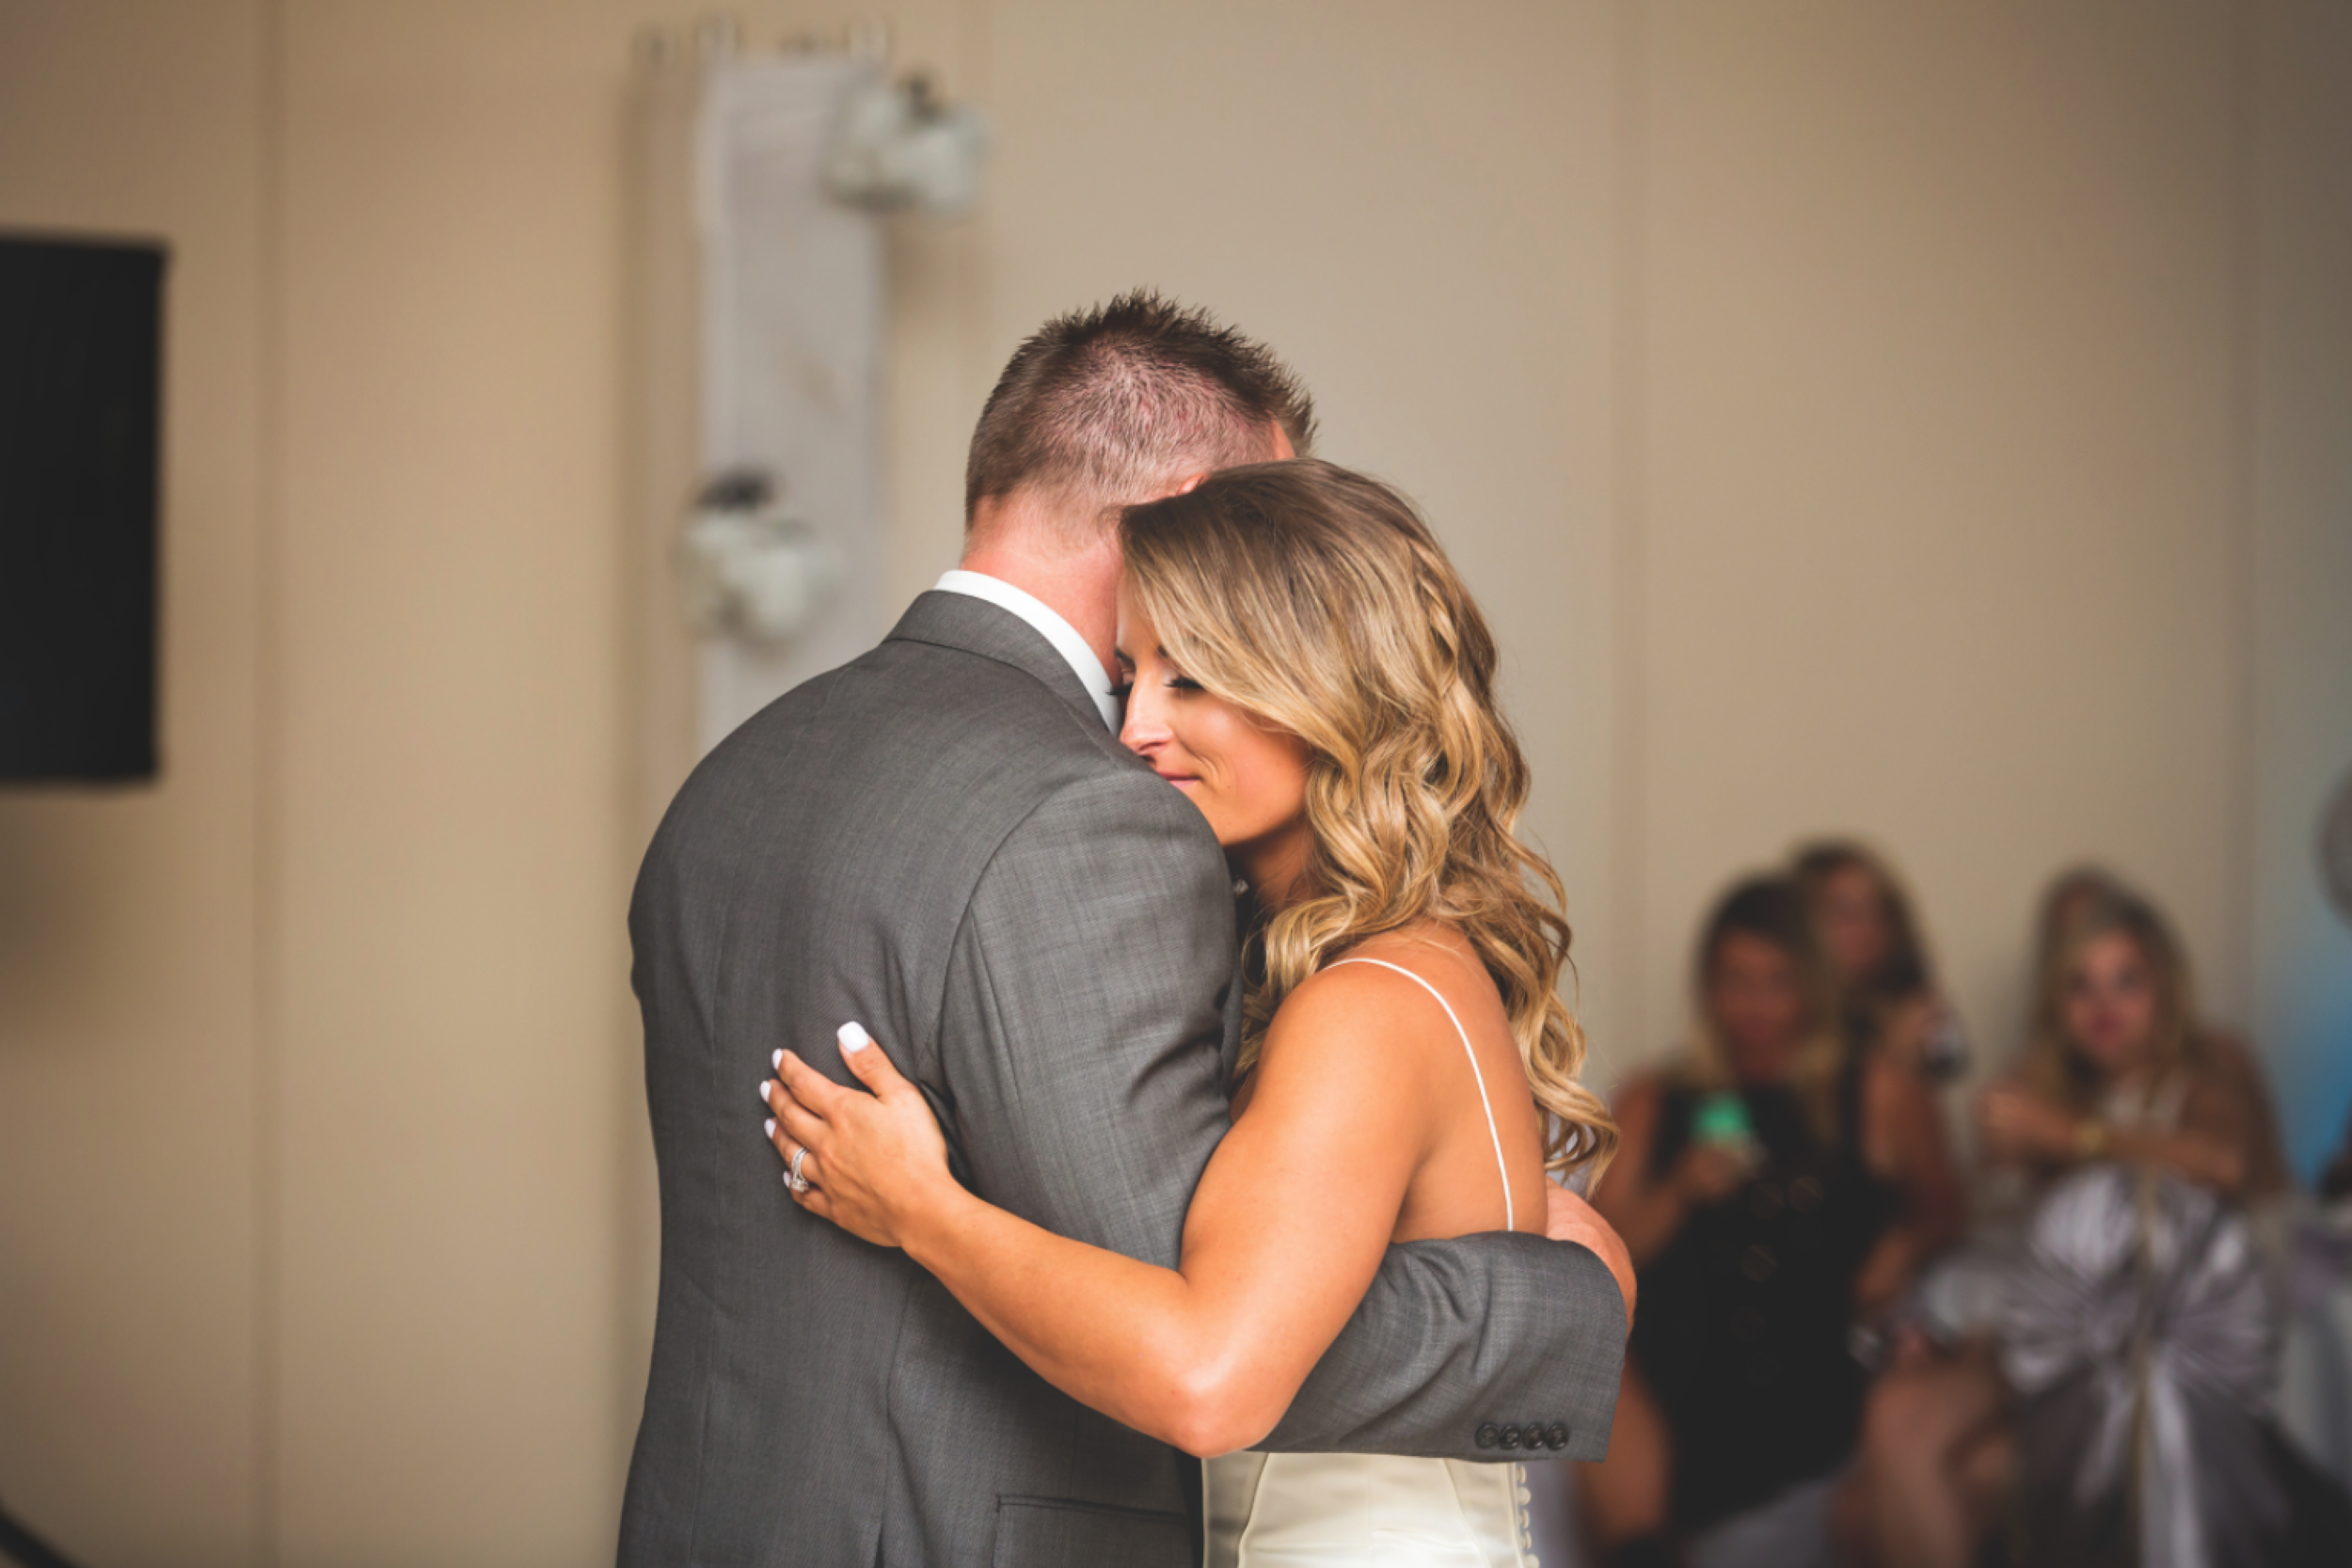 Wedding-Burlington-Convention-Center-Burlington-Oakville-Toronto-Hamilton-Niagara-Wedding-Photographer-Photography-Moments-by-Lauren-Photo-Image-53.png